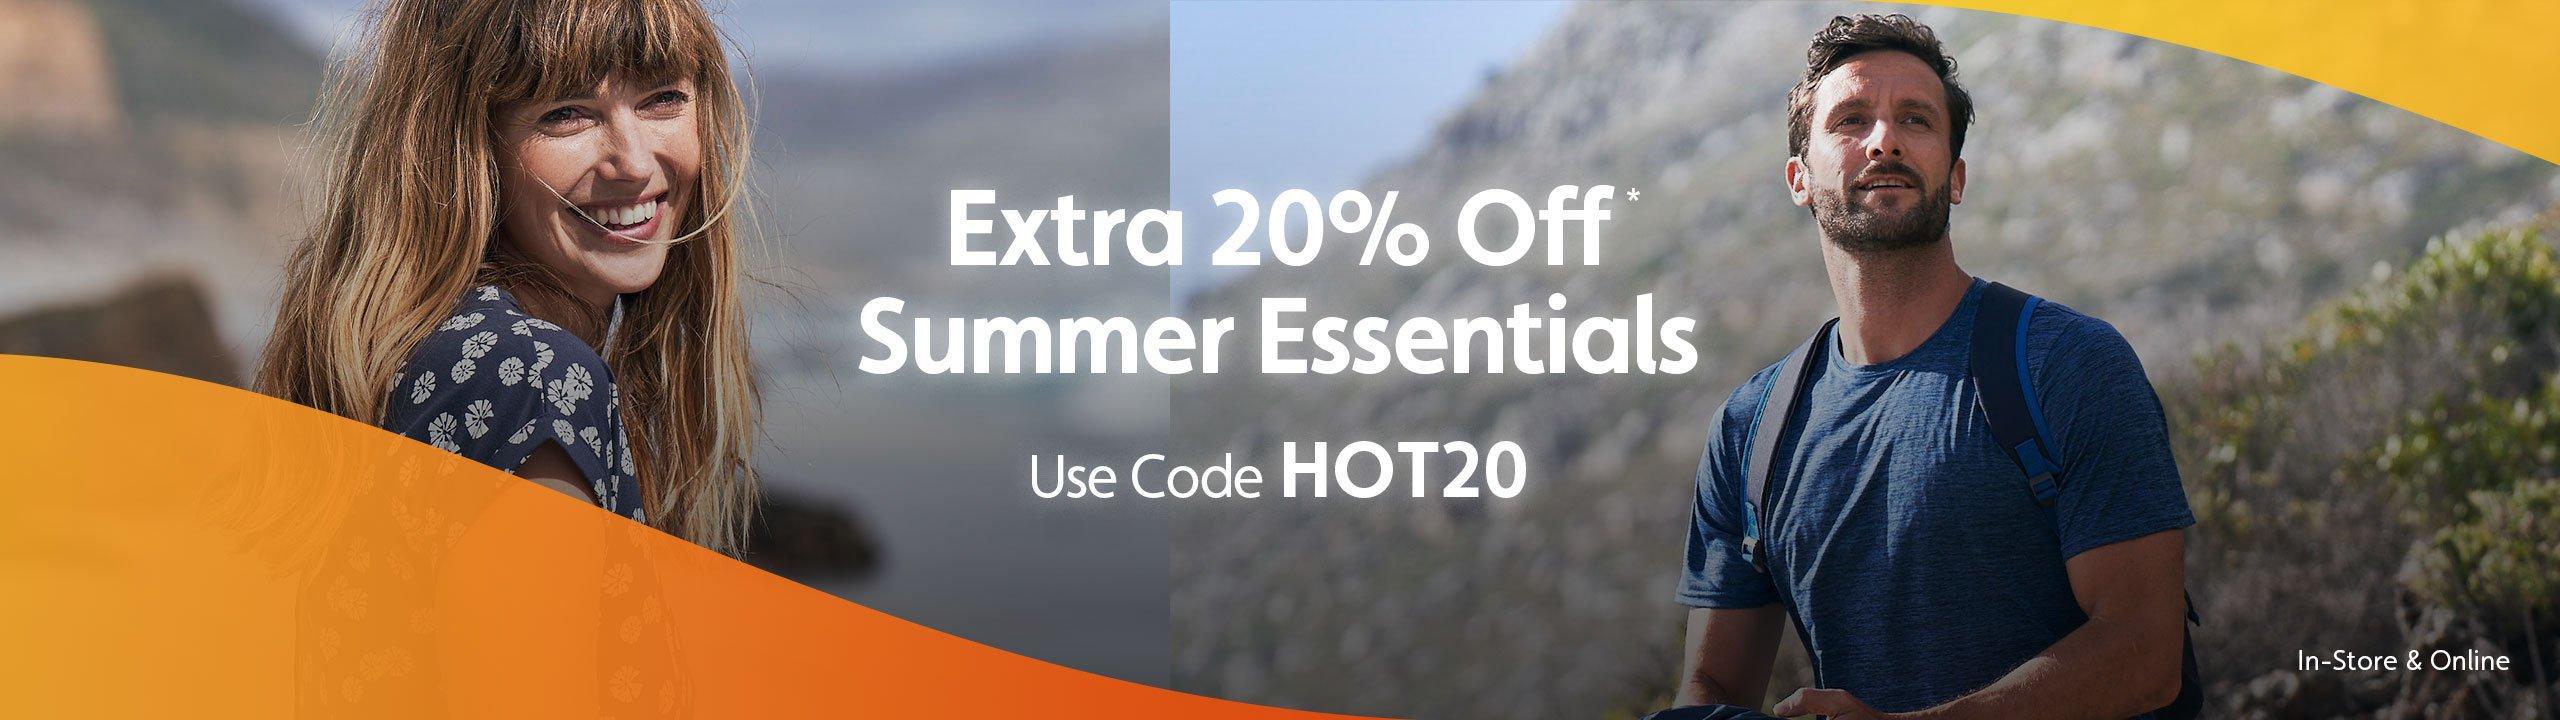 Extra 20% Off Summer Essentials